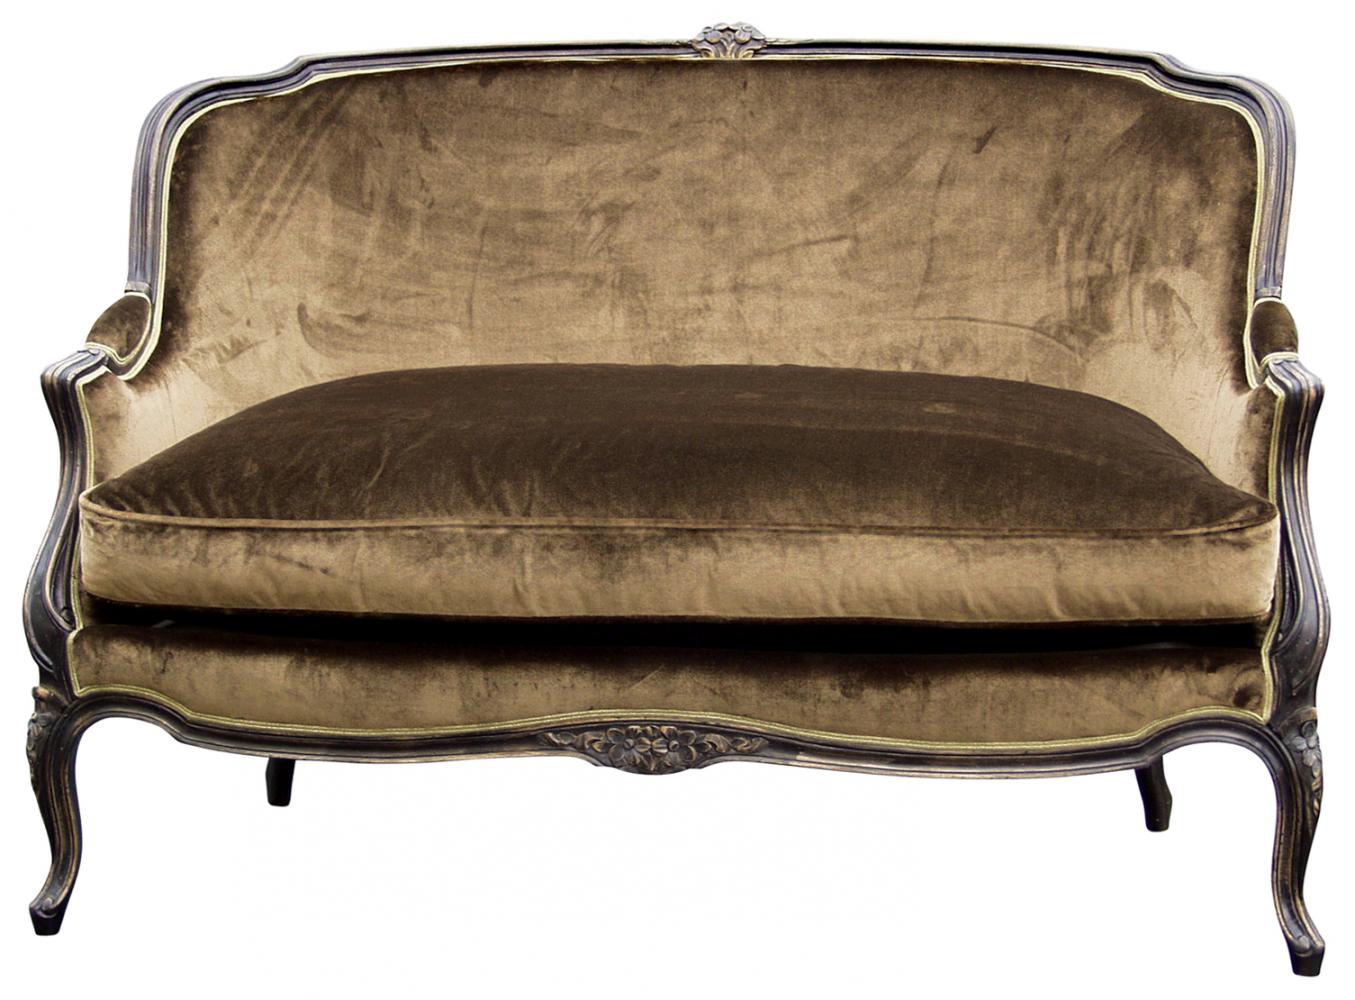 Gilles nouailhac canap louis xv gondole 0 1 sofa for Louis xv canape sofa